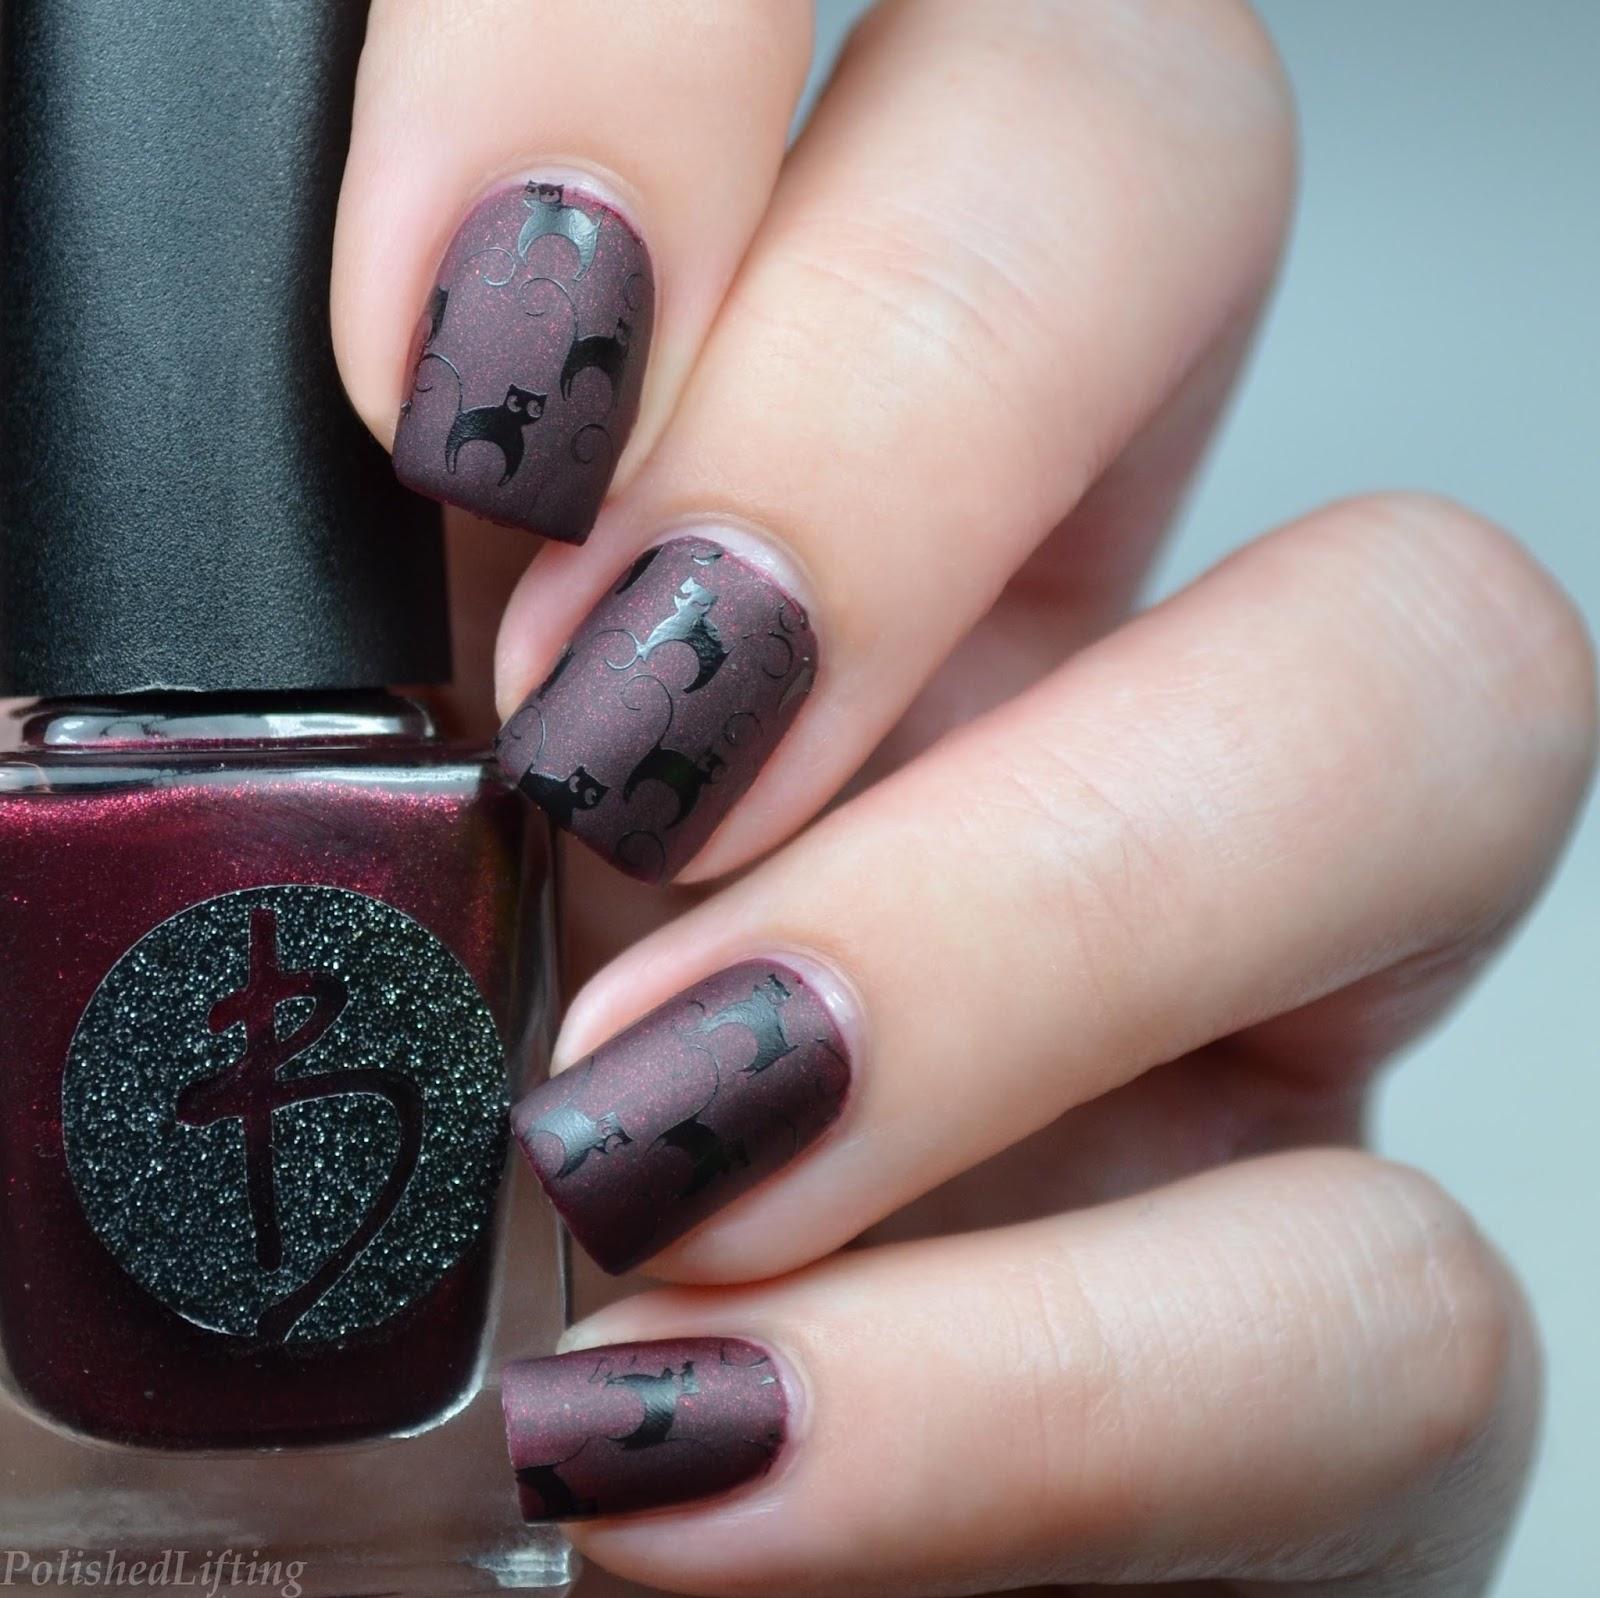 Polished Lifting: 16 Halloween Nail Art Ideas